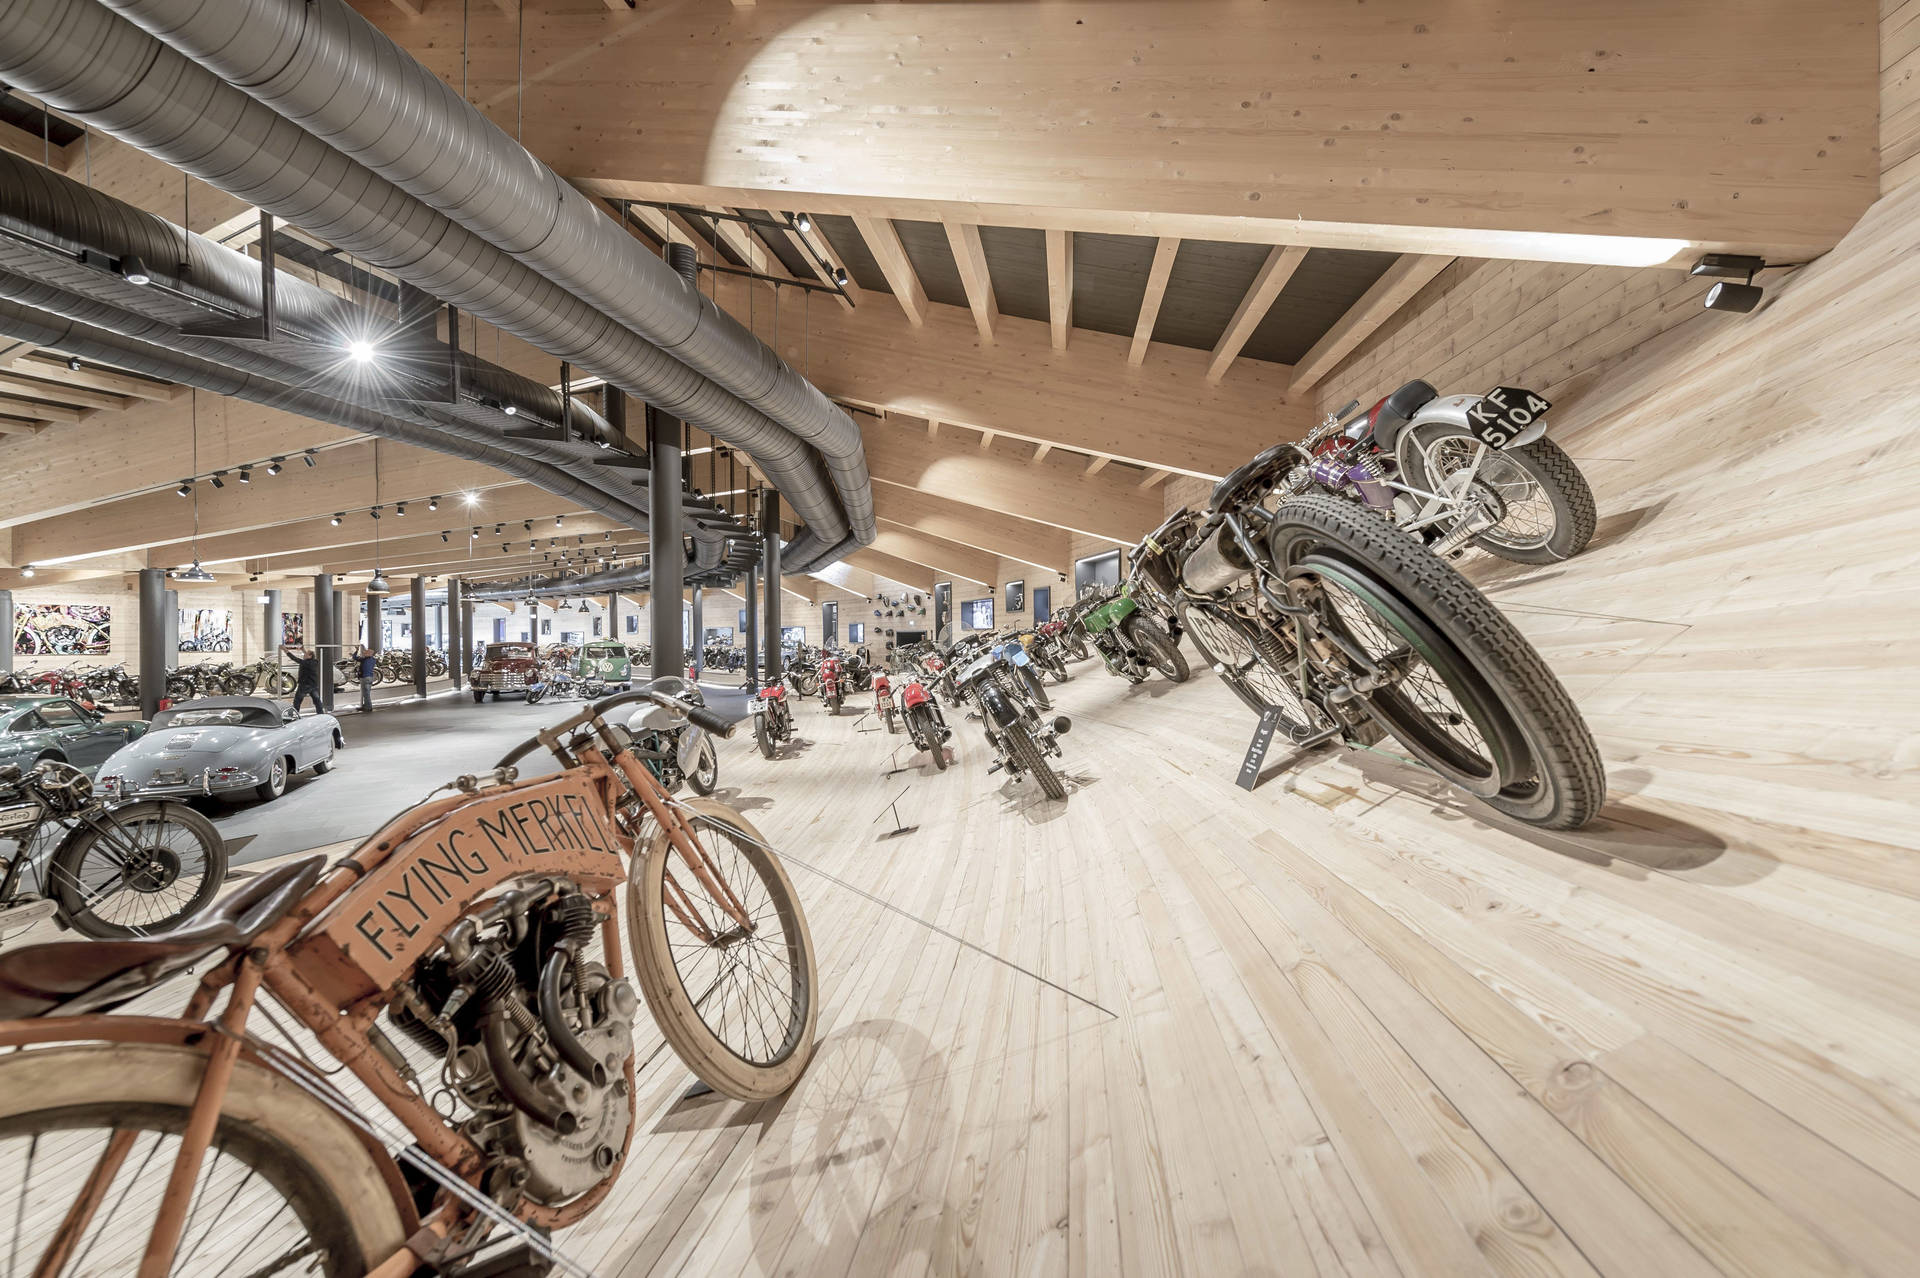 Einmalige PS Schätze im Top Mountain Motorcycle Museum in